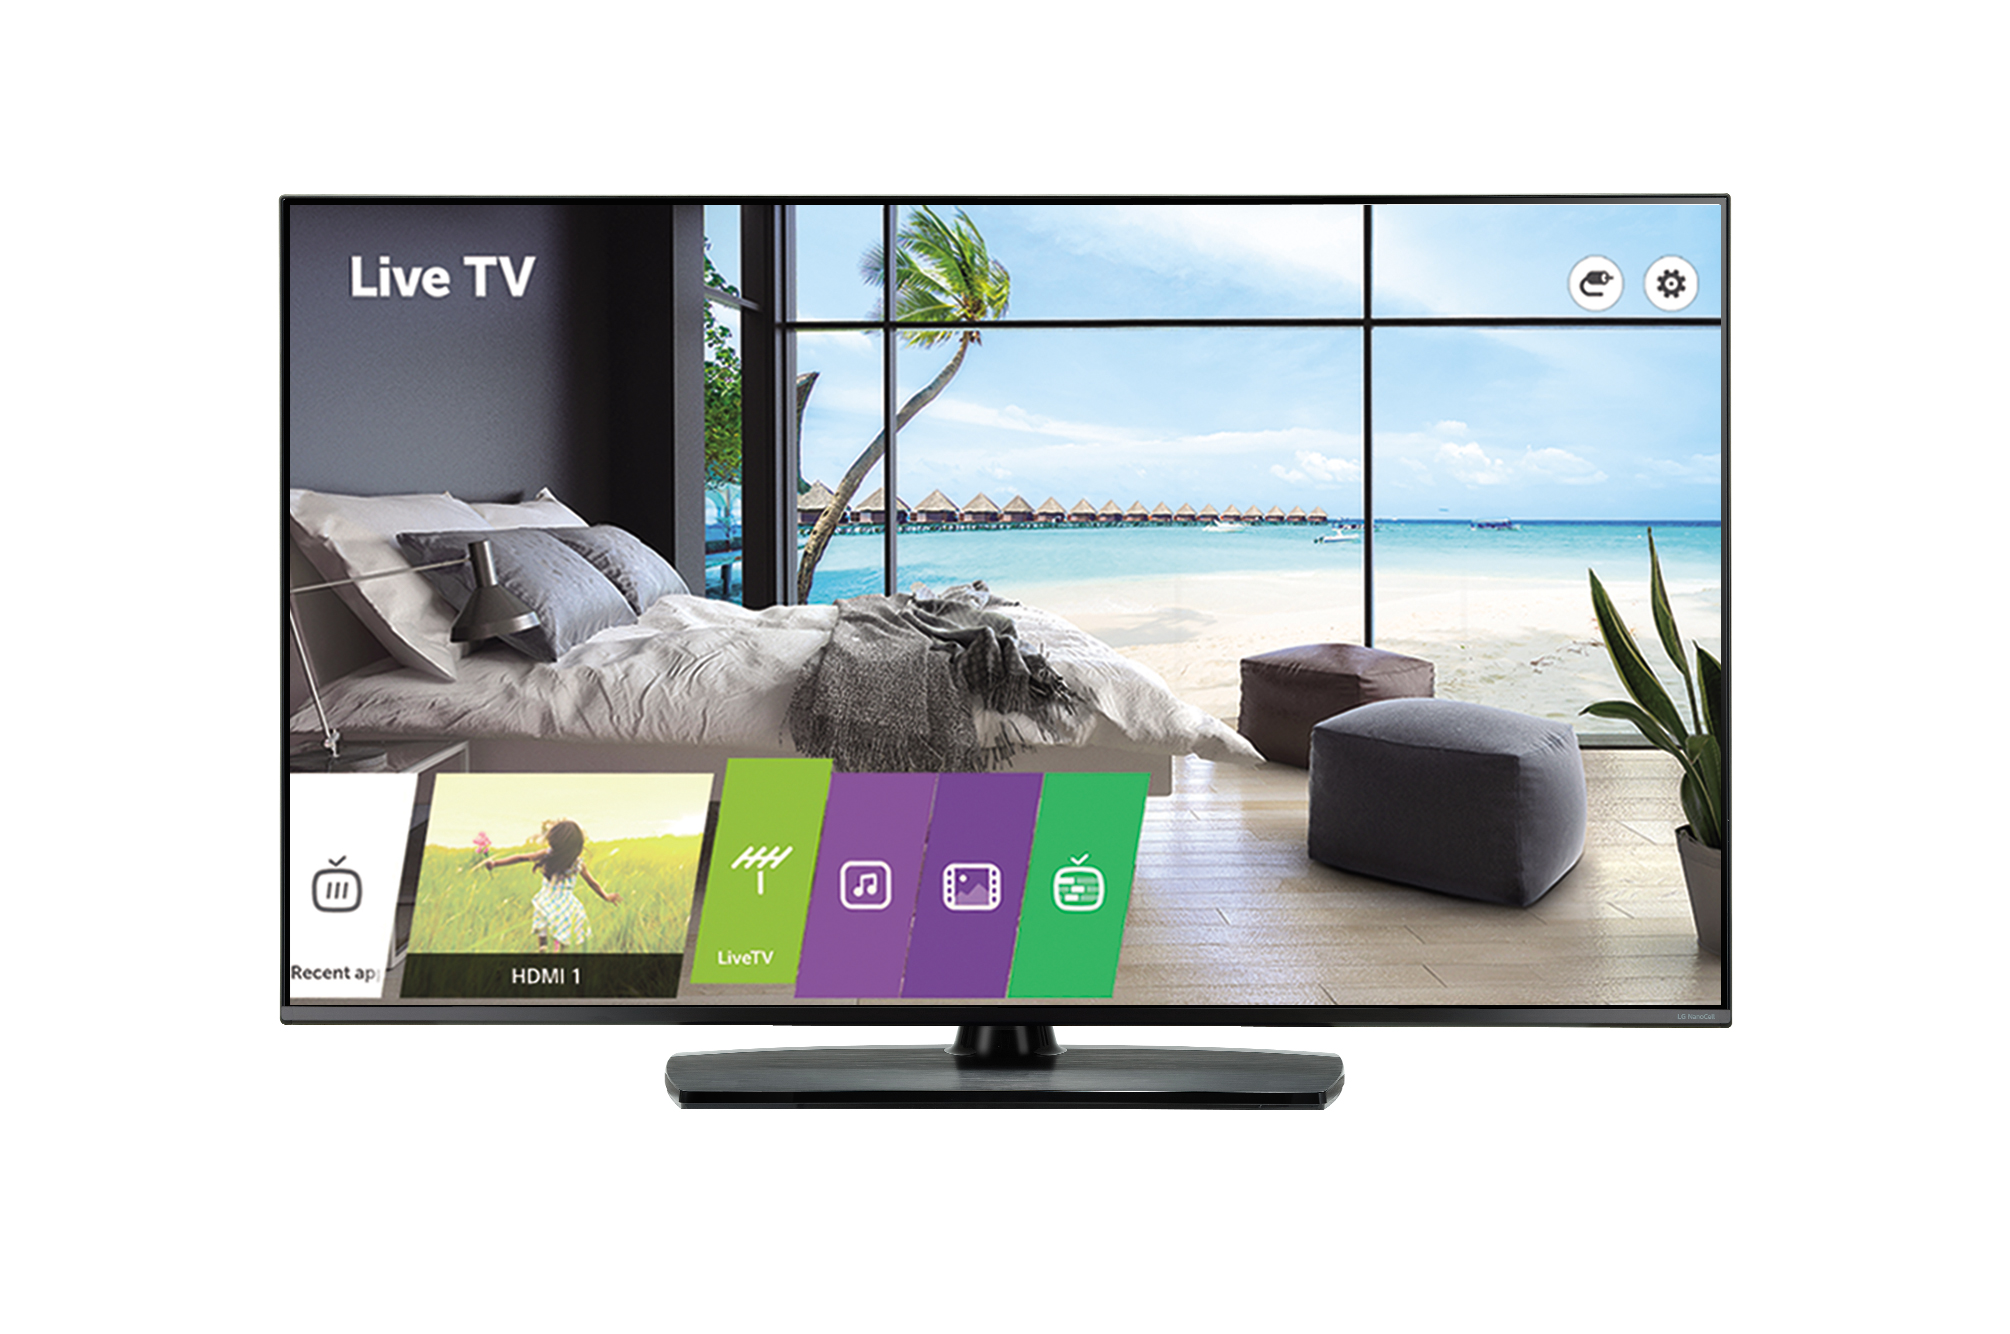 LG Pro:Centric SMART 55UT761H (ASIA)